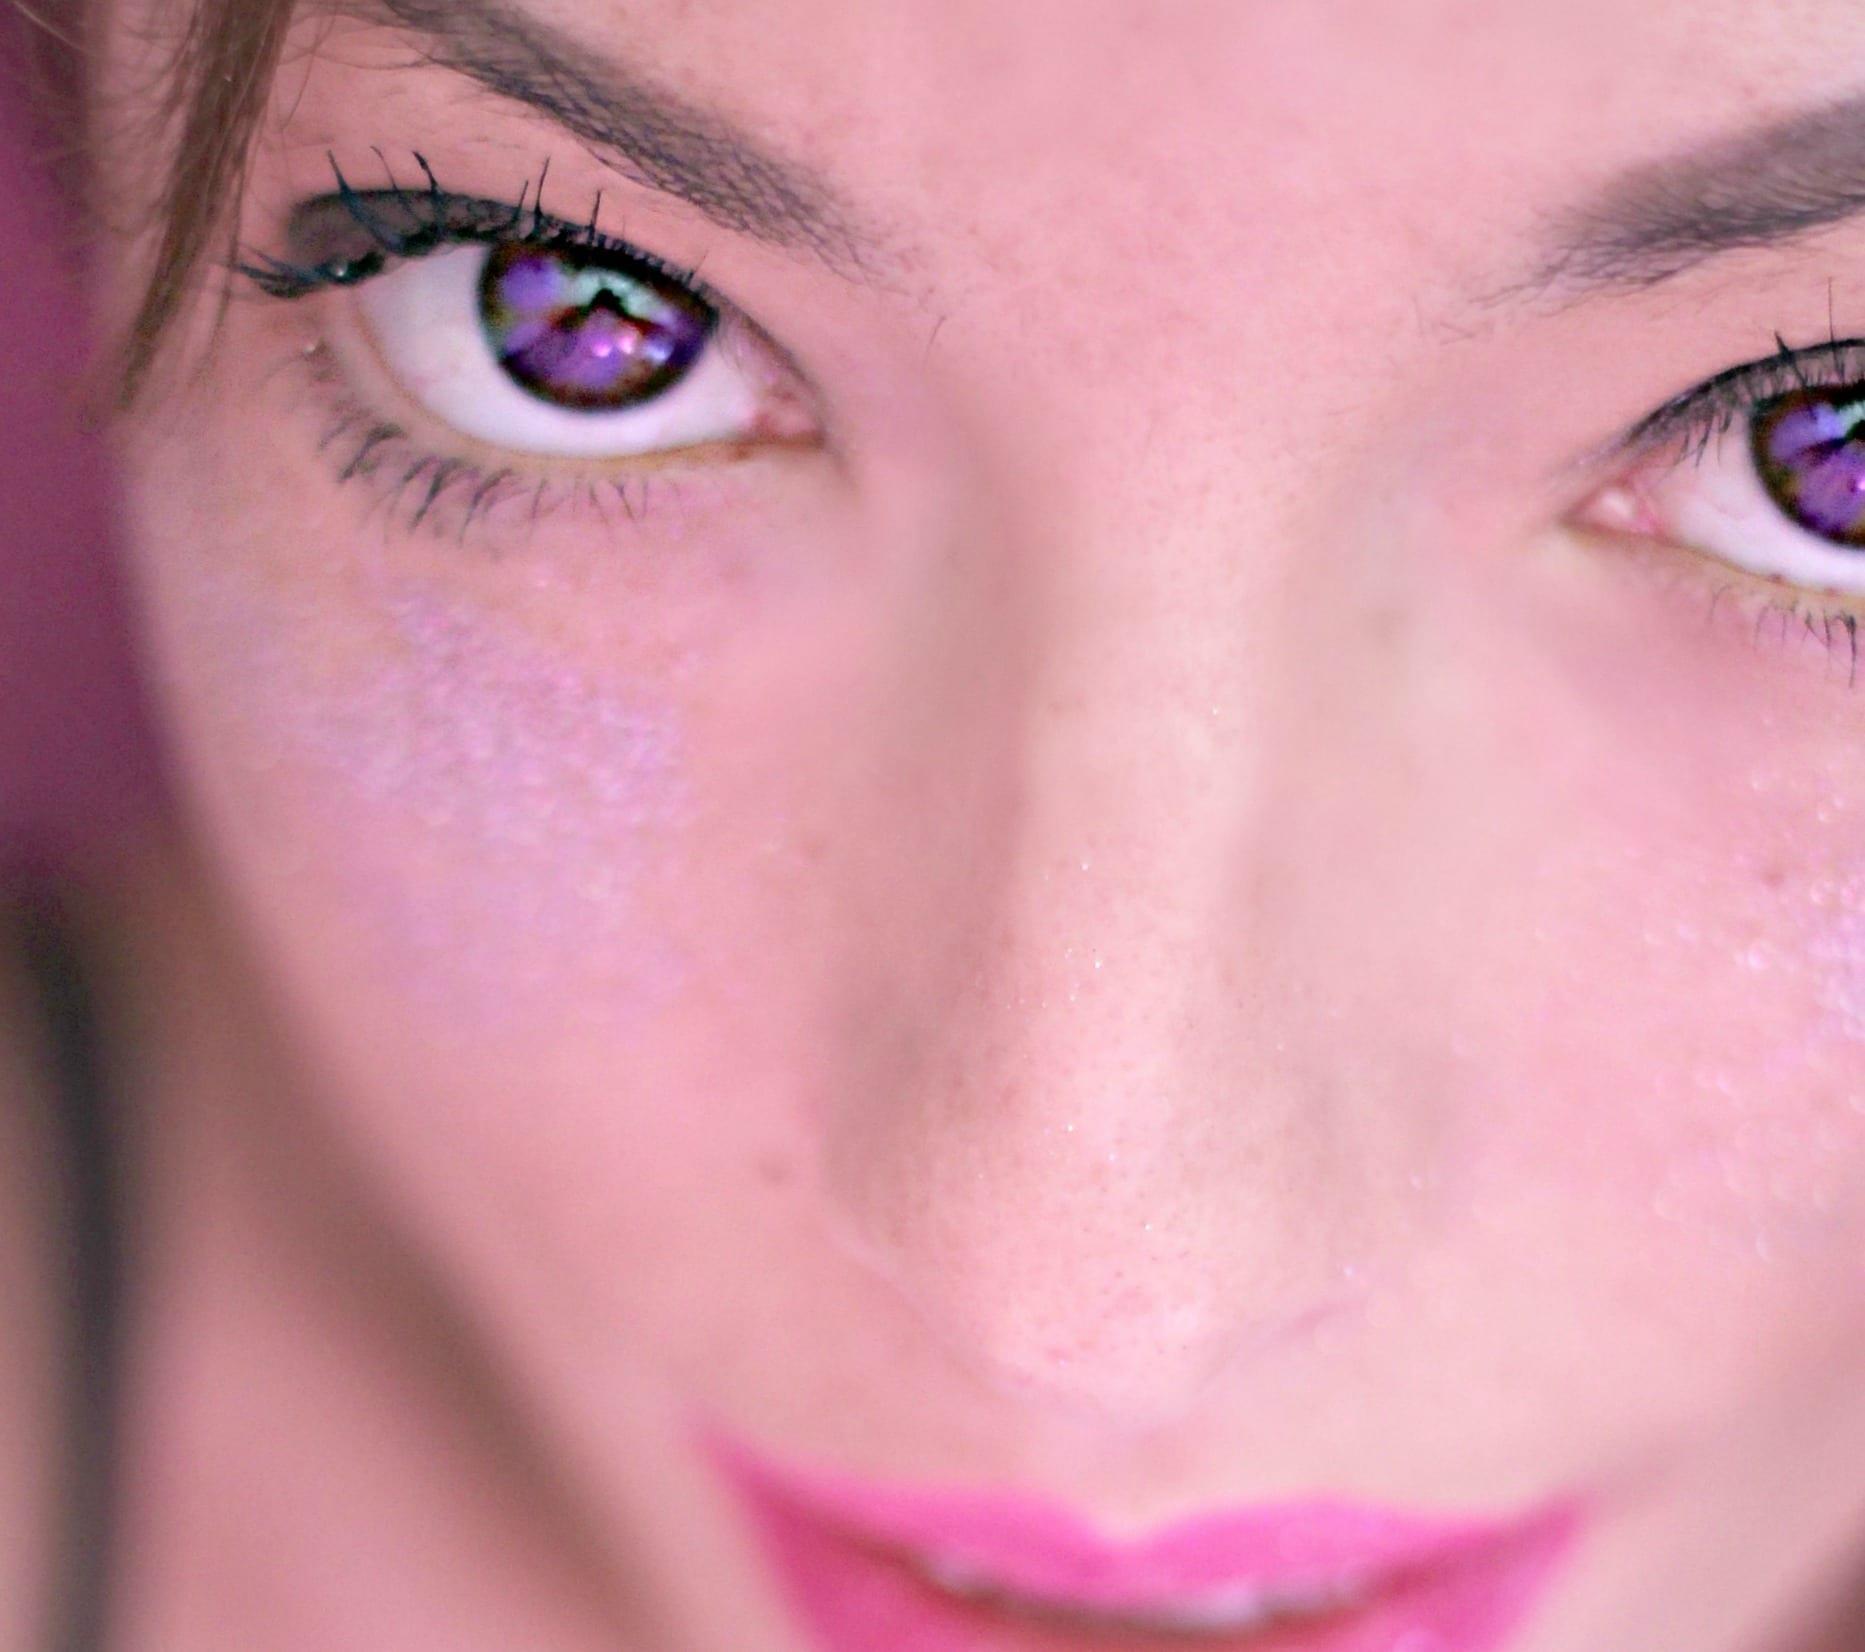 elisa bellino, 1, theladycracy.it, pink, pink editorials, fashion blog italia